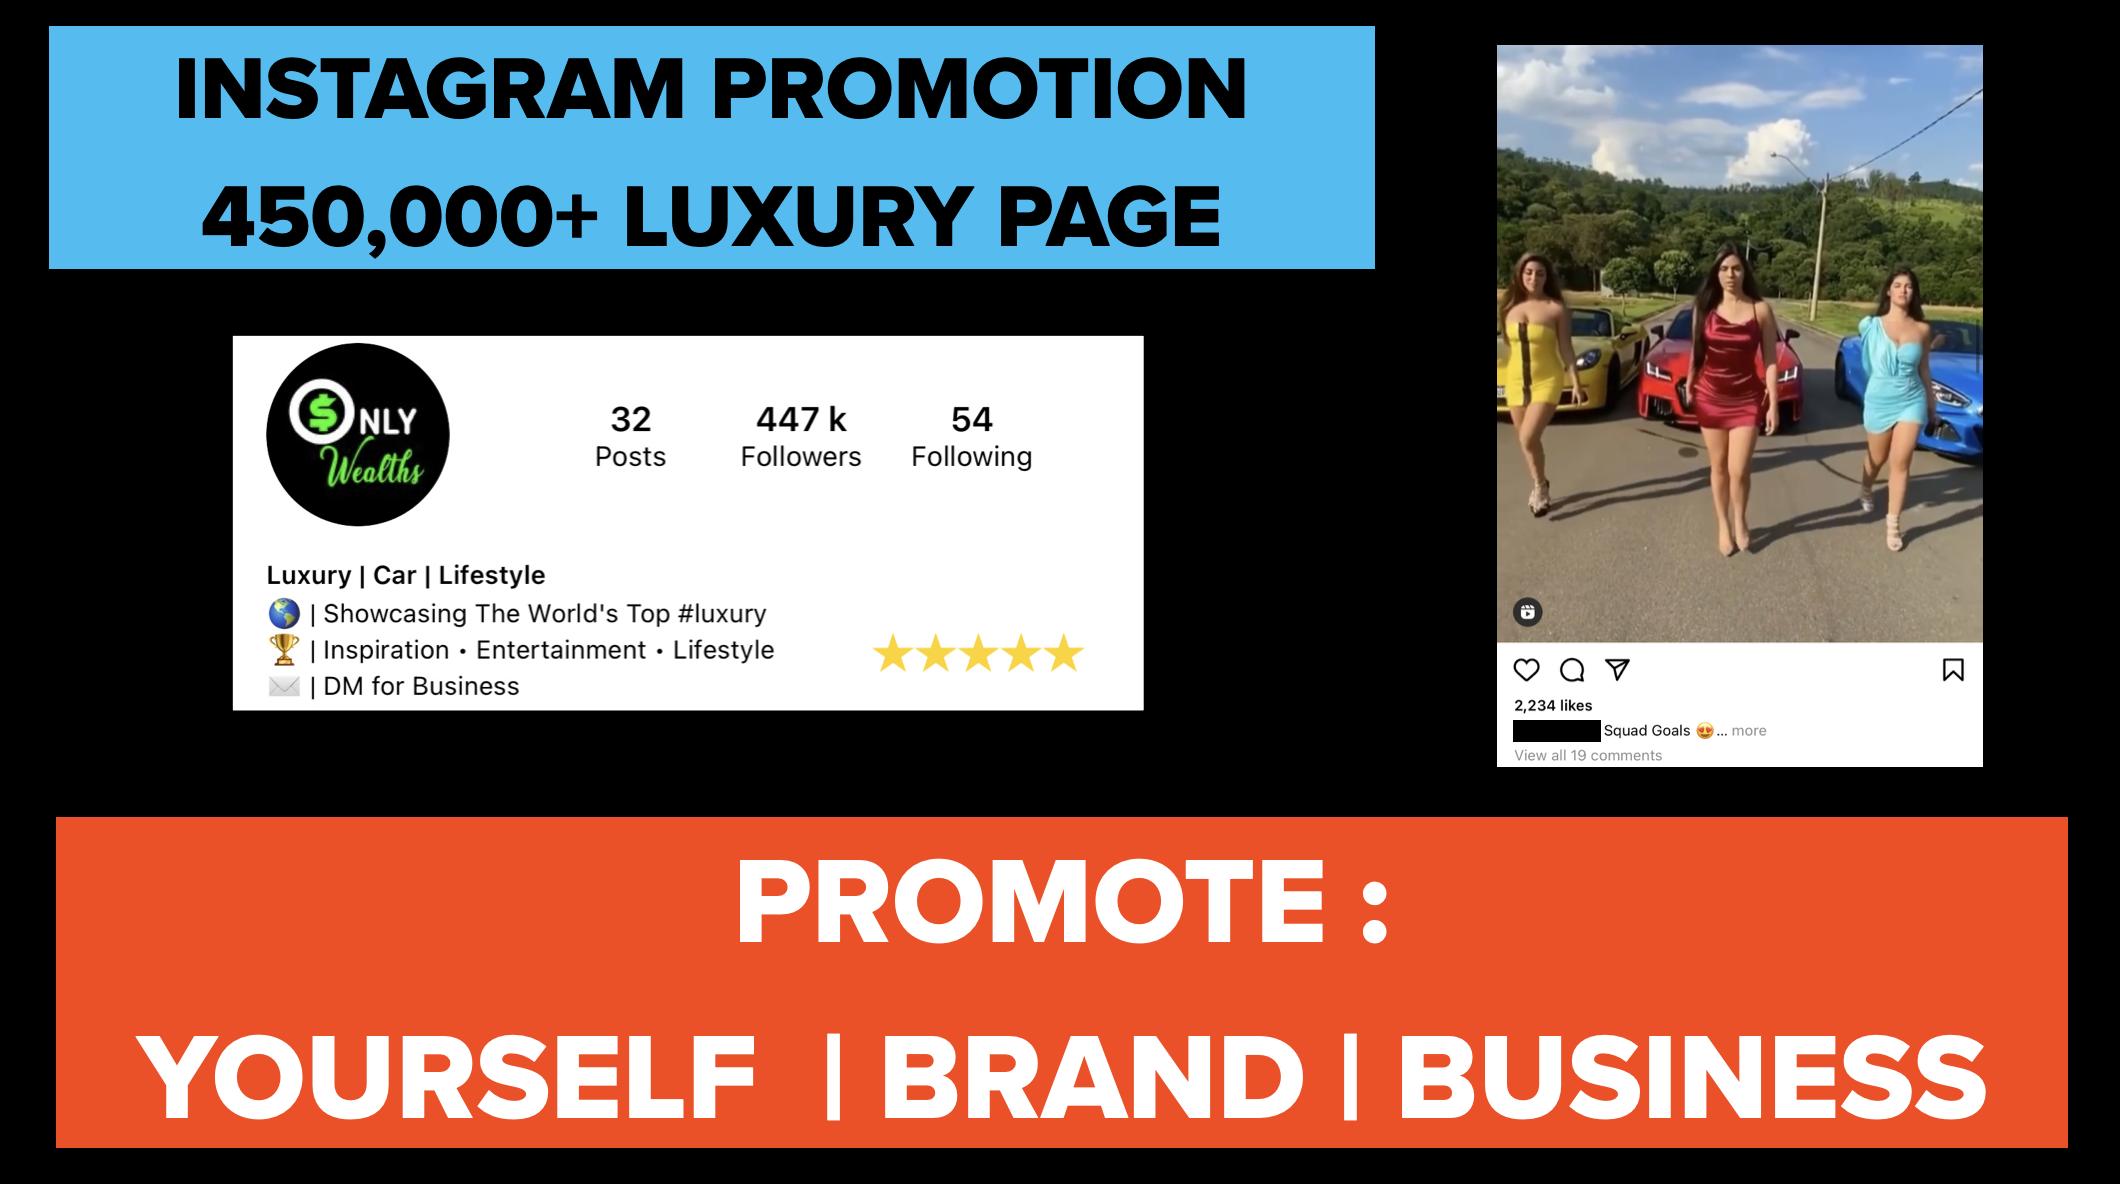 IG Promotion on share on 450k luxury IG Page